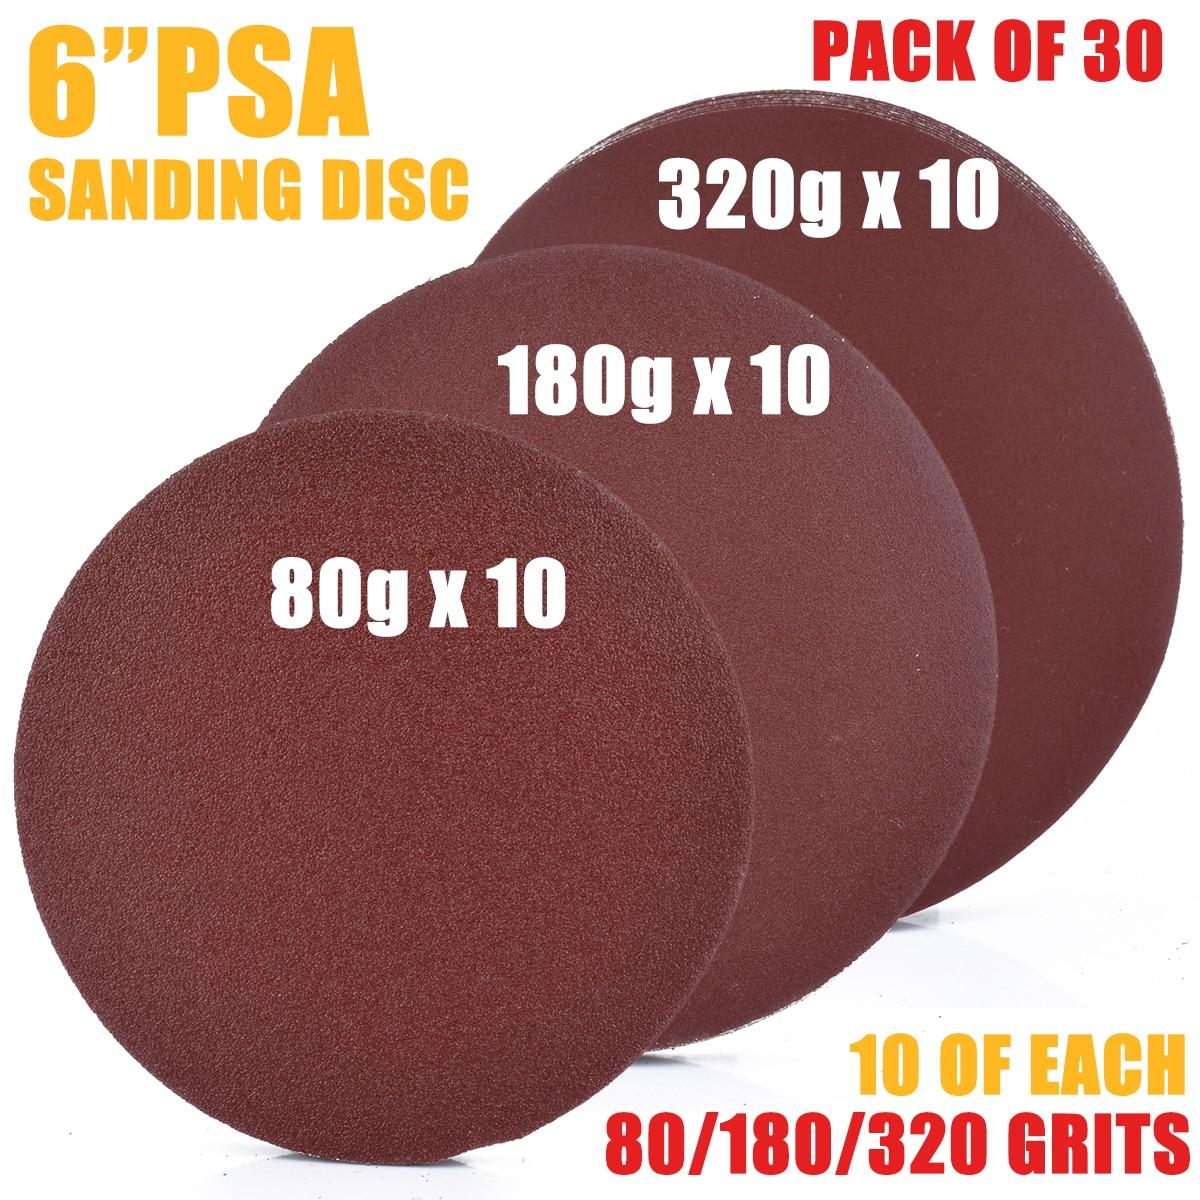 "5/"" Stick on psa Sanding Discs 120 Grit 10PCS Autobody"